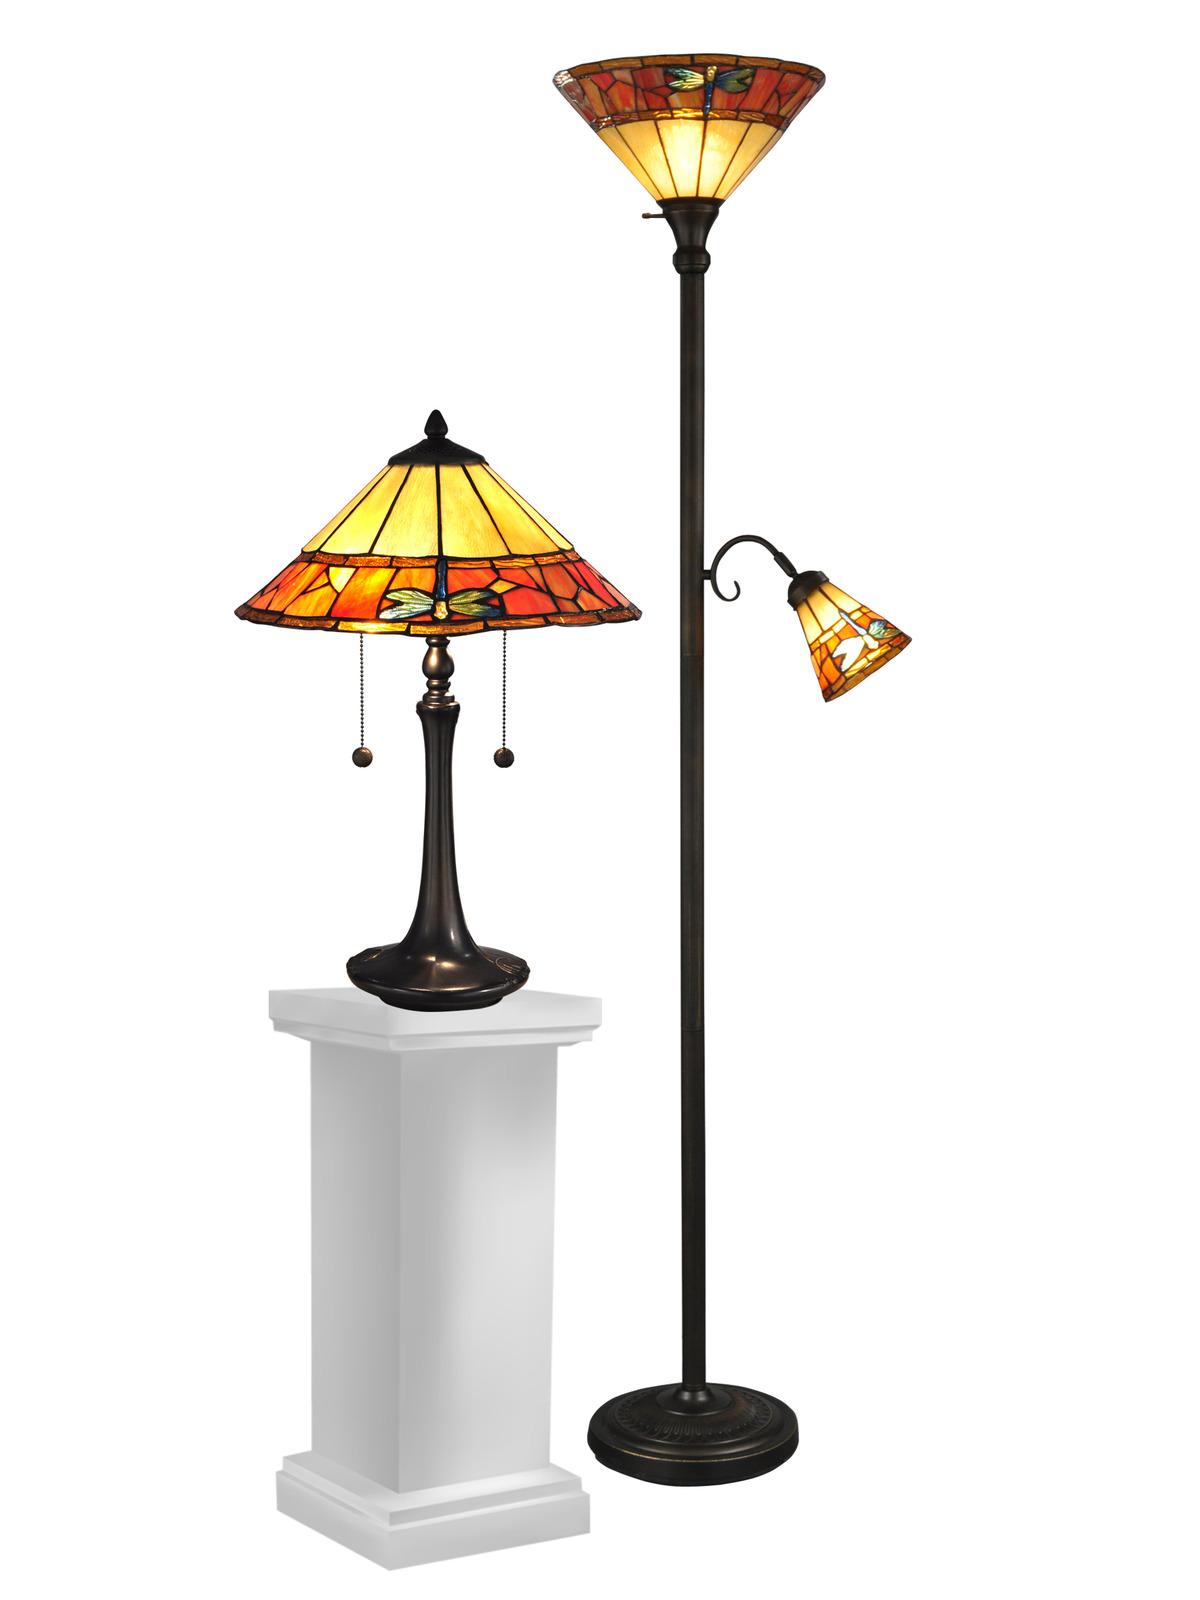 Dale tiffany genoa table and floor lamp set lamps for Gotham tiffany style downbridge floor lamp